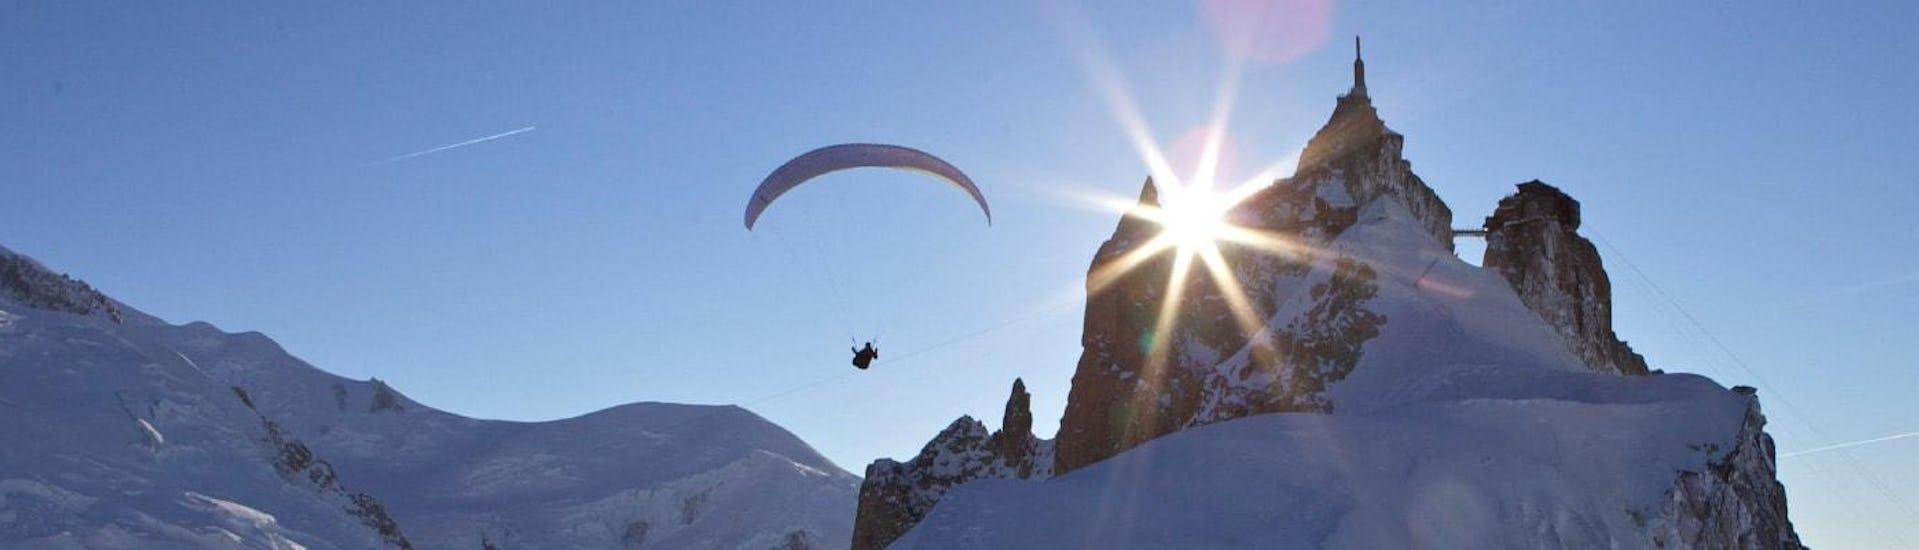 A paragliding pilot from Kailash Paragliding is doing a Tandem Paragliding Flight from Plan de l'Aiguille against a mountain backdrop.